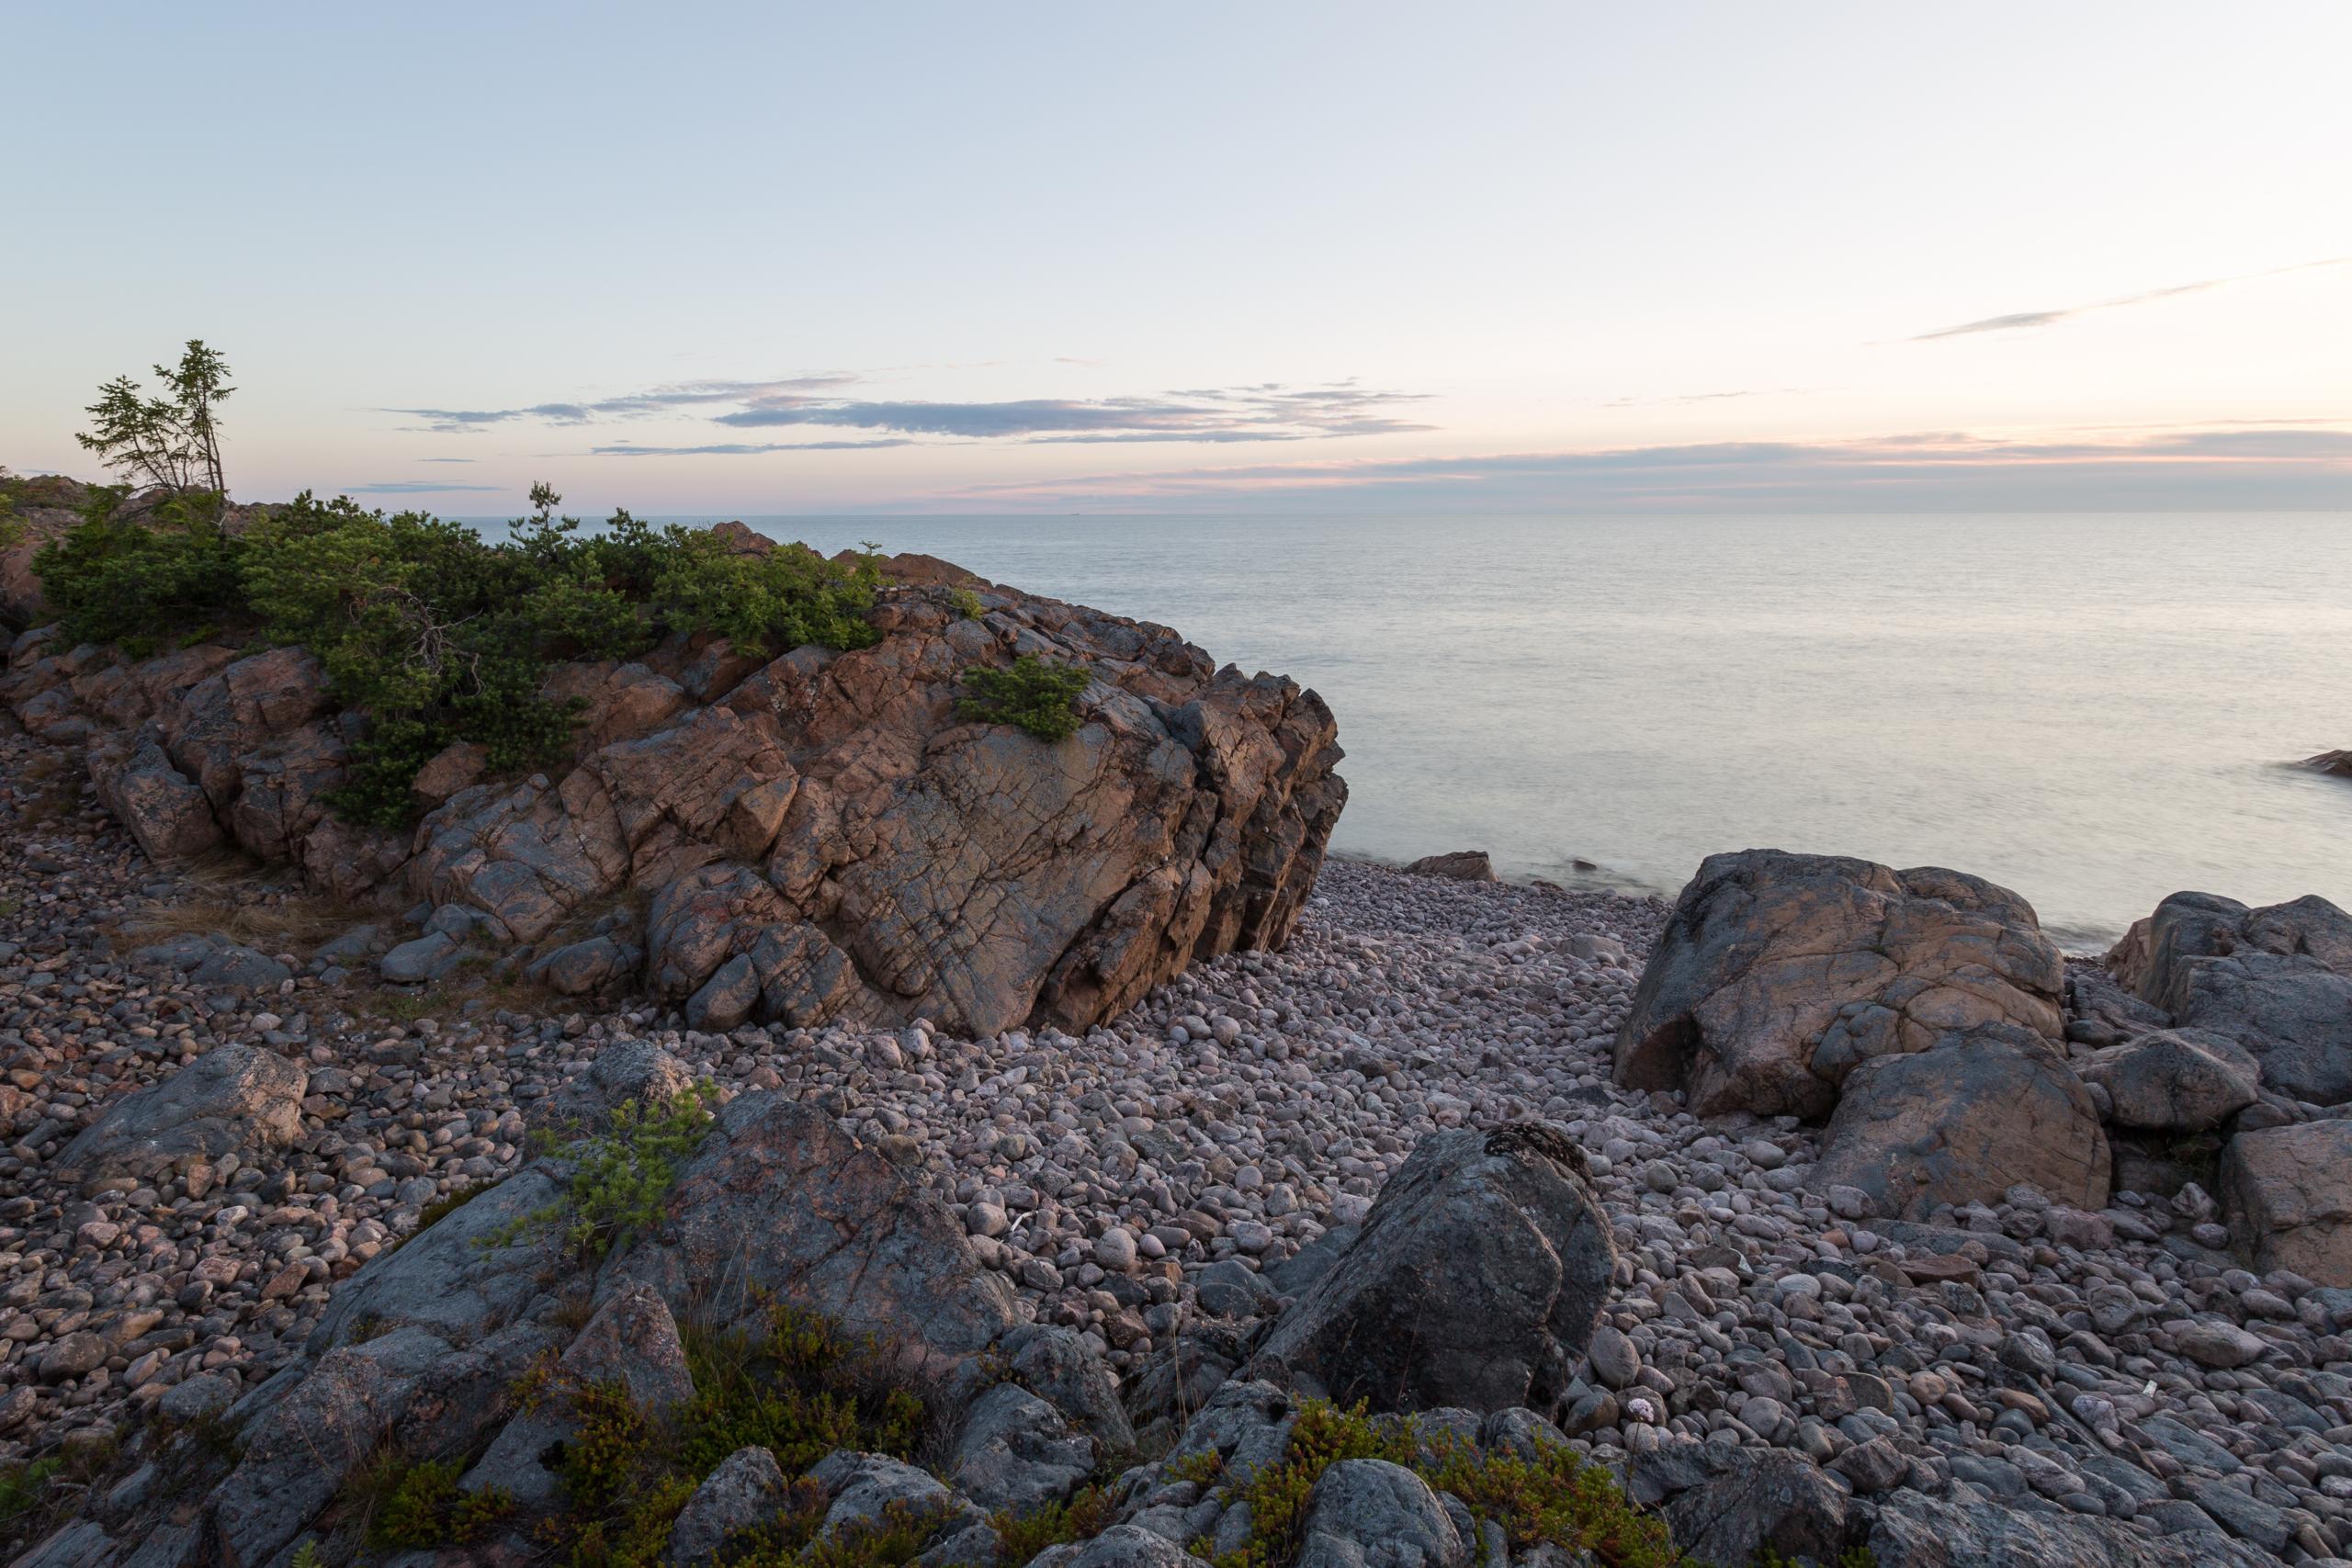 09072016-kapplasse-naturreservat-6